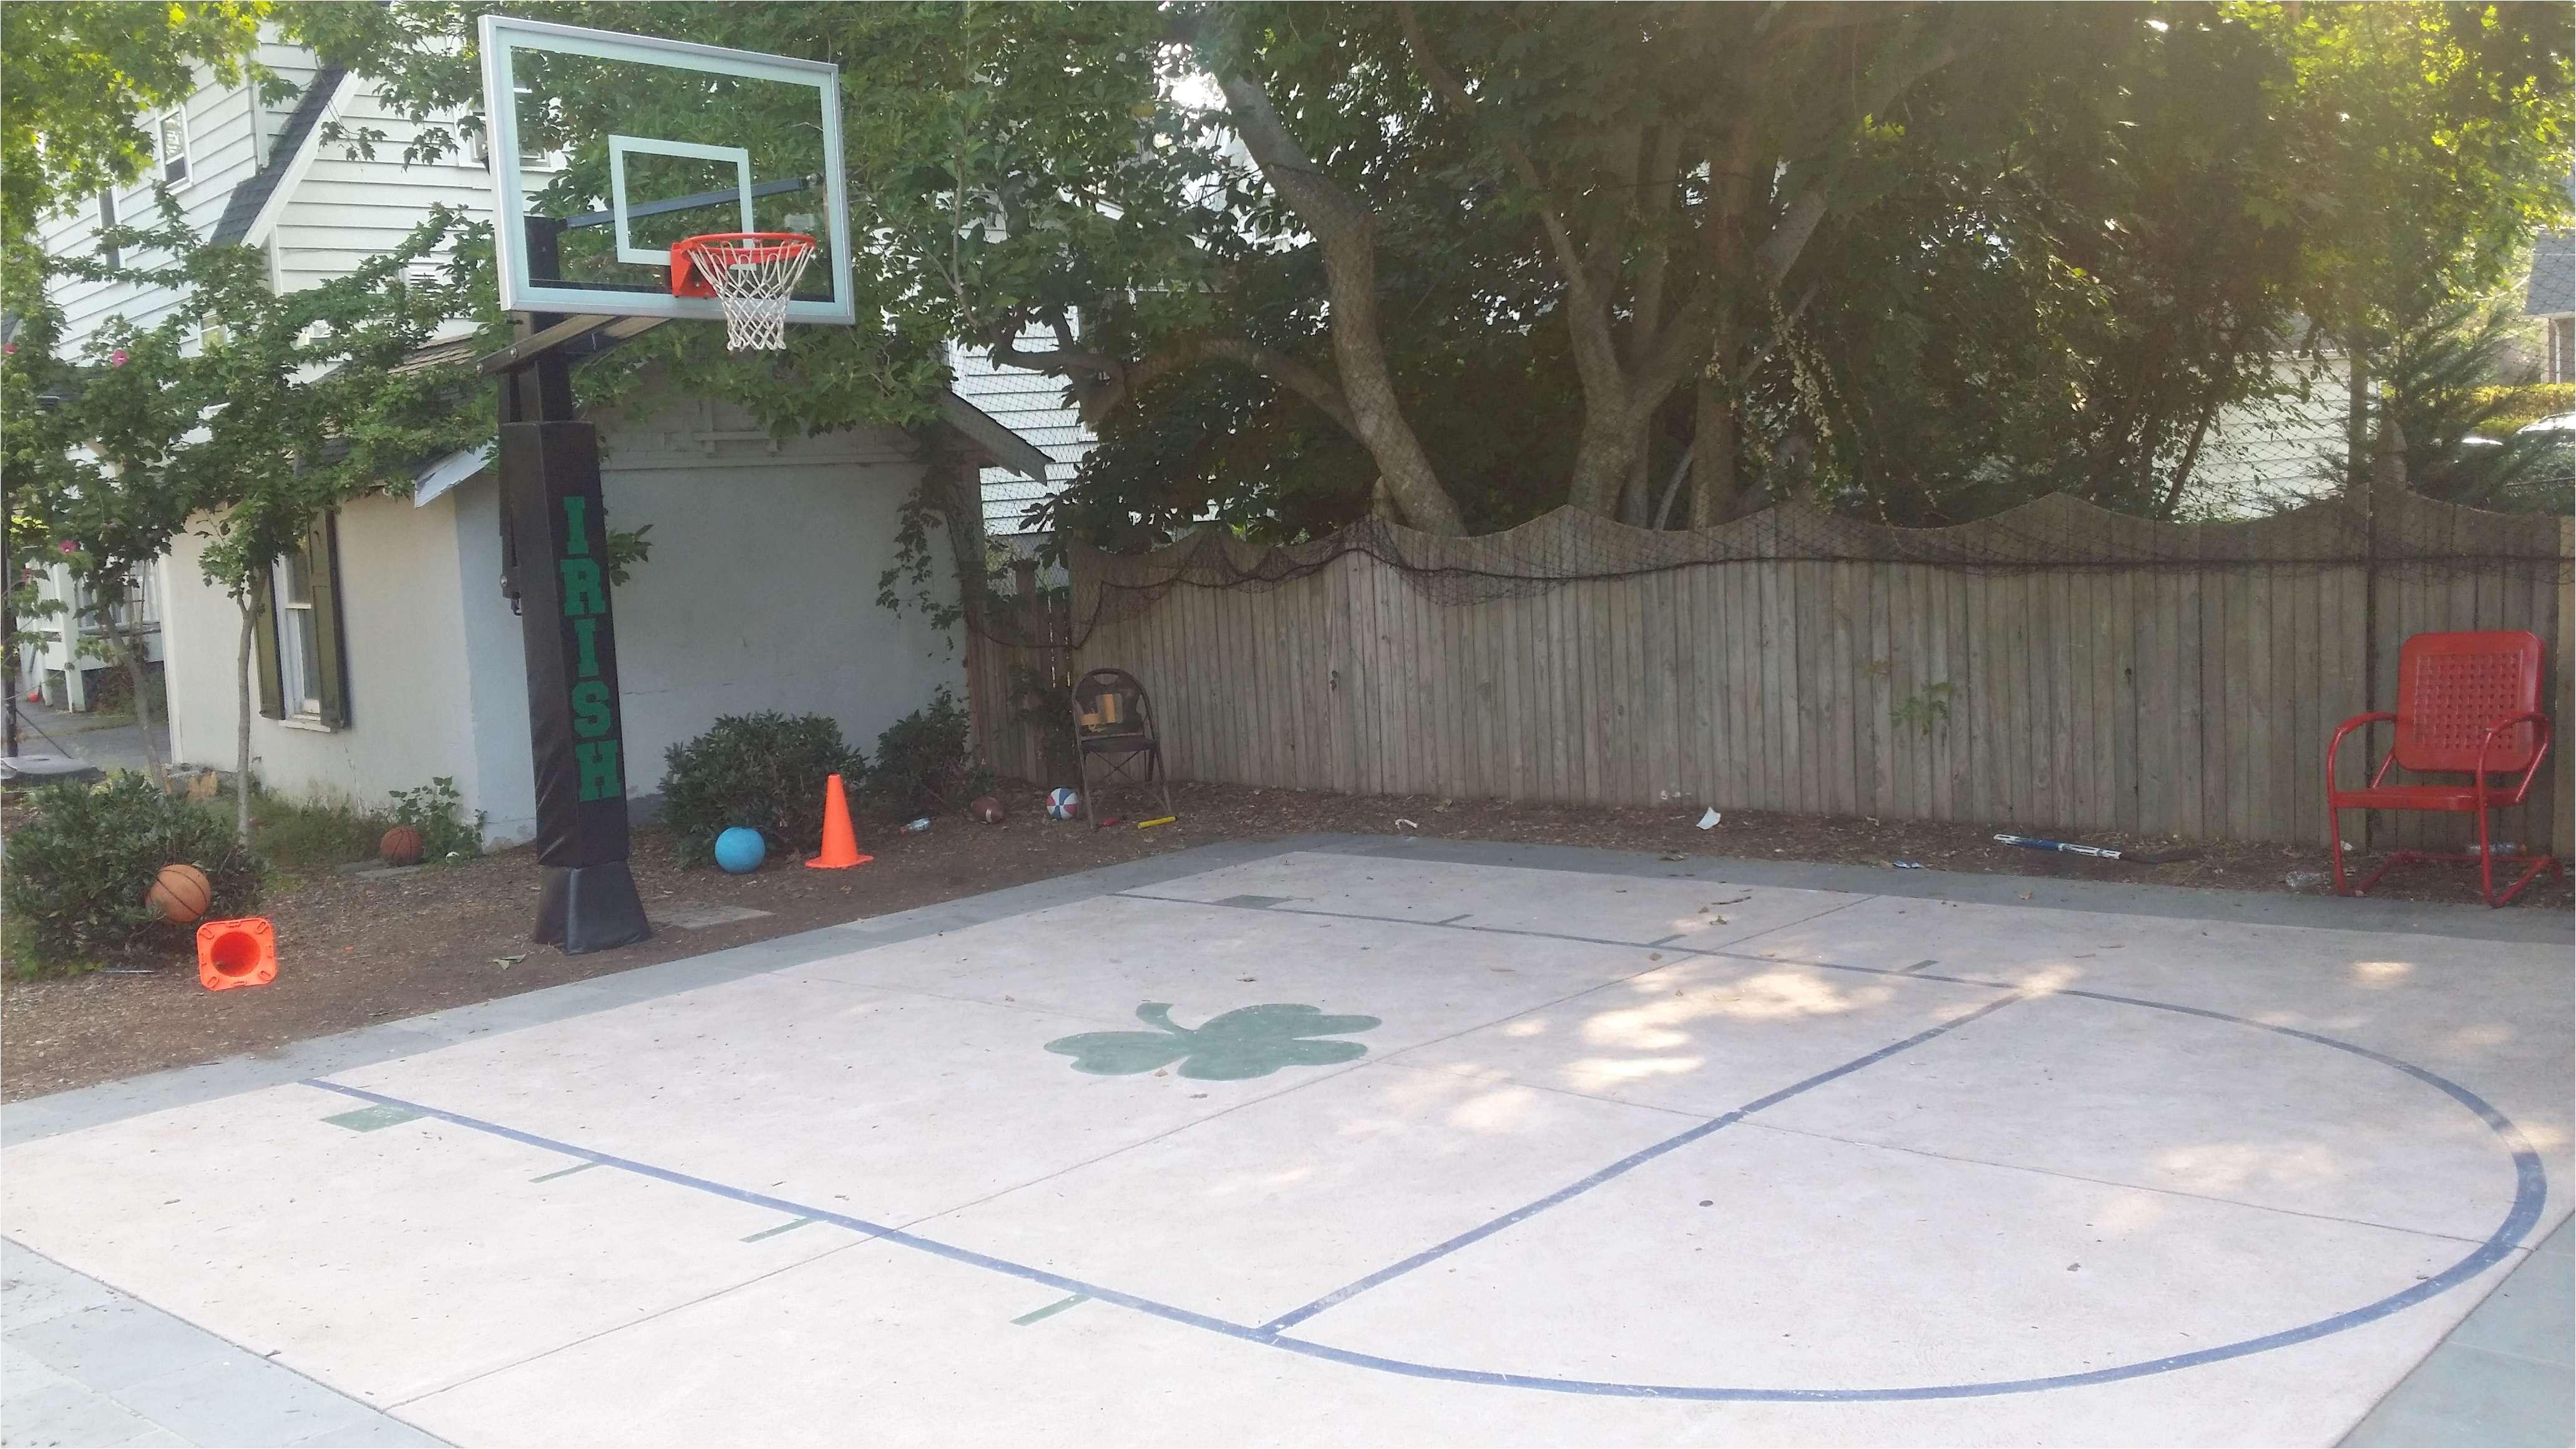 backyard basketball court service unique cheap outdoor basketball court flooring lovely e side od a of